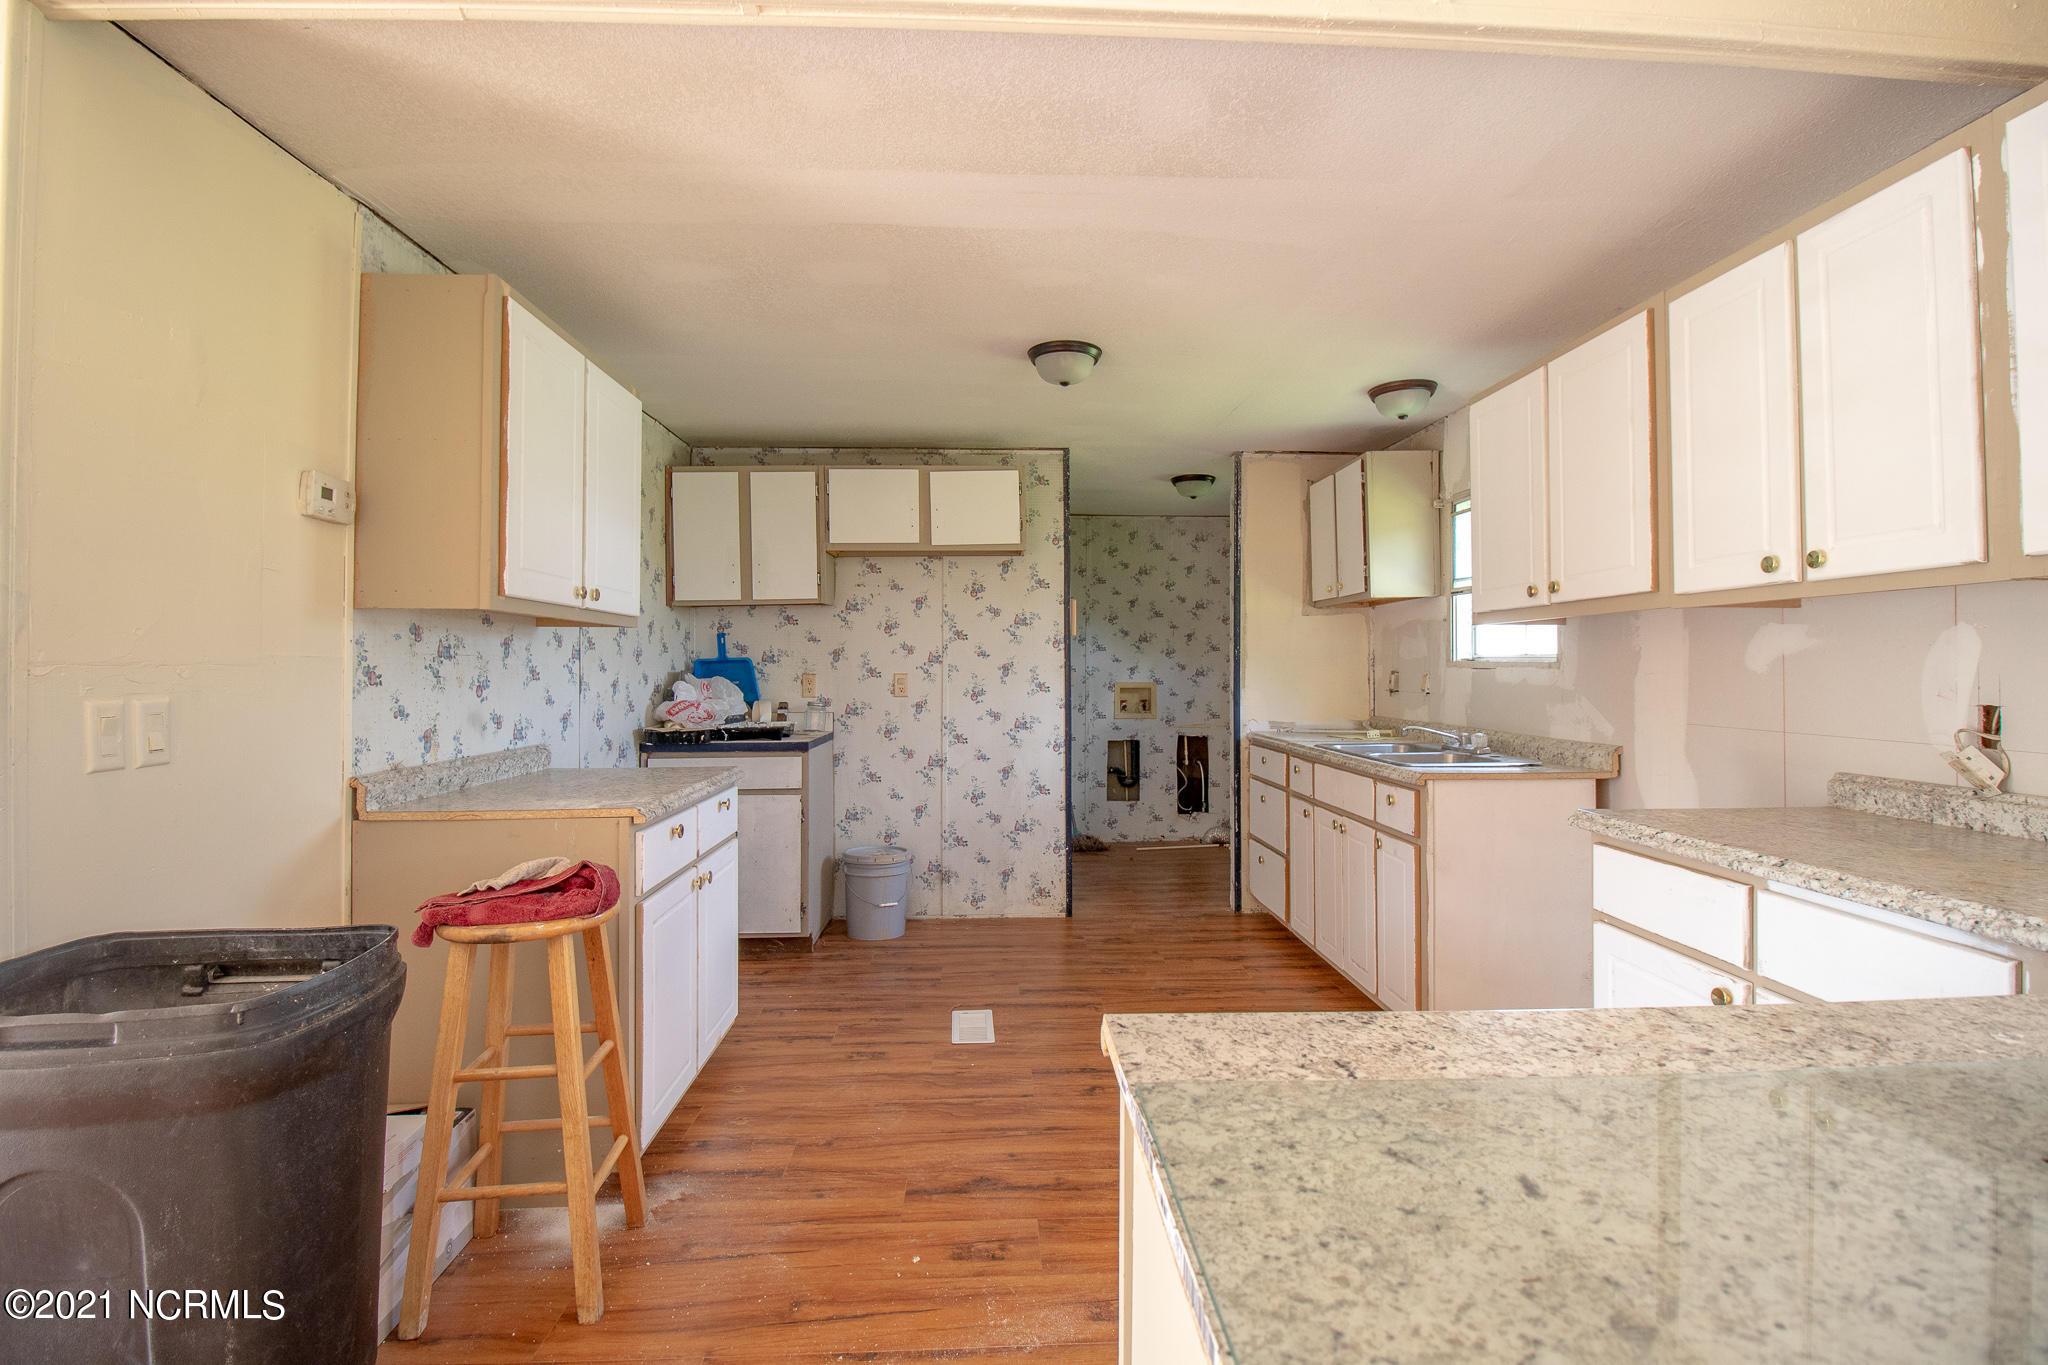 5116 Doe Run Court, Rocky Mount, North Carolina 27803, 4 Bedrooms Bedrooms, 8 Rooms Rooms,2 BathroomsBathrooms,Manufactured home,For sale,Doe Run,100278613